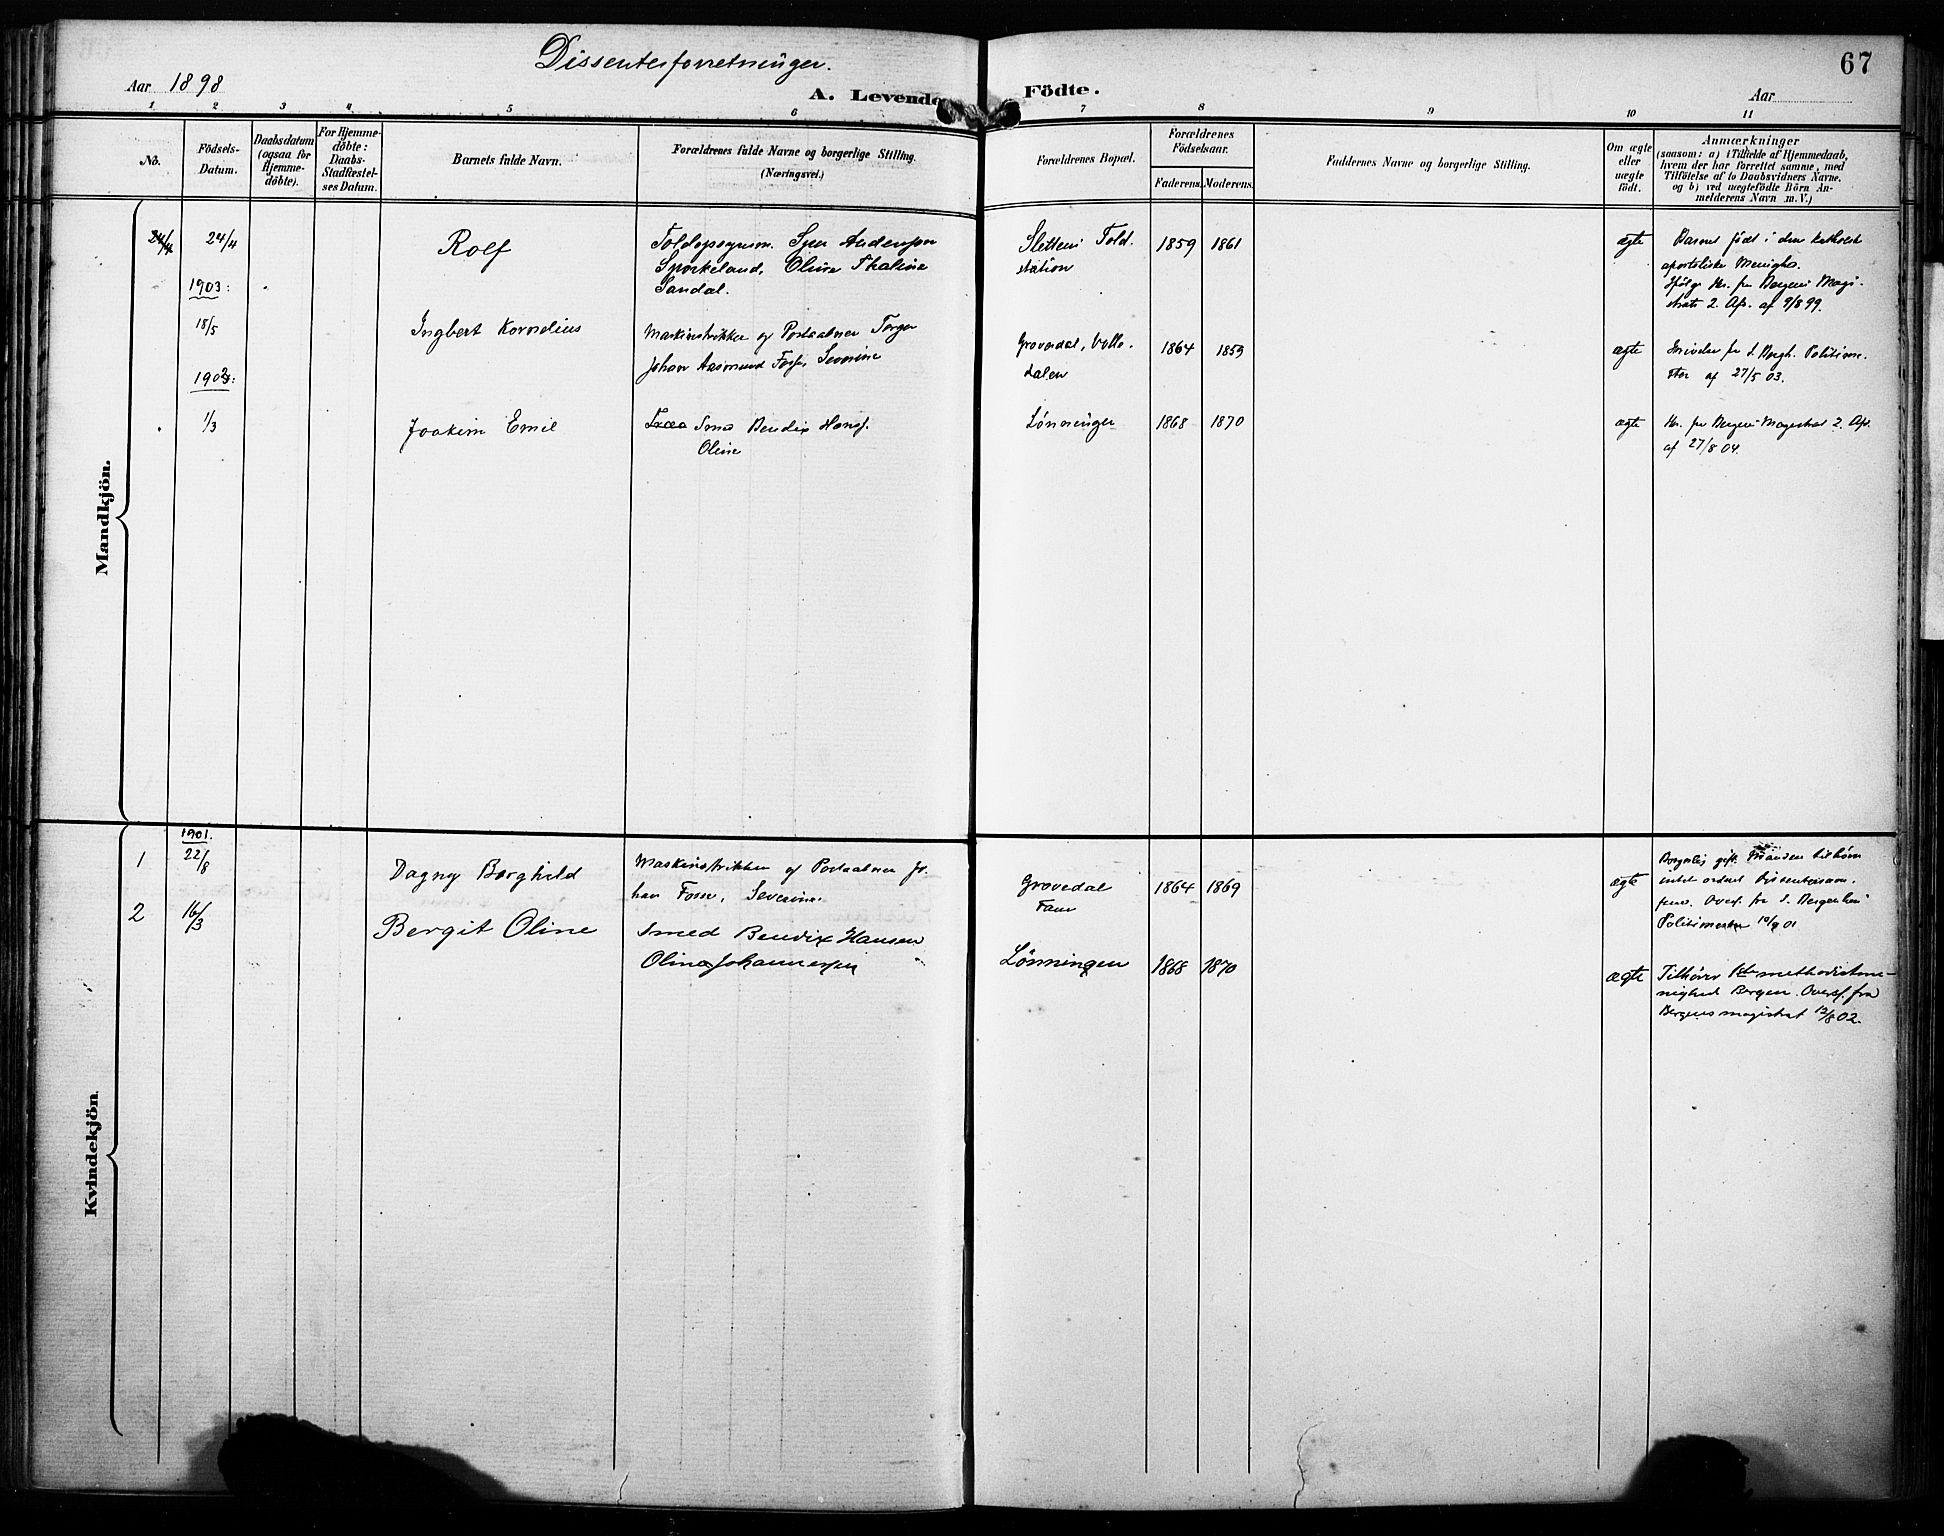 SAB, Fana Sokneprestembete, H/Haa/Haab/L0003: Ministerialbok nr. B 3, 1898-1907, s. 67